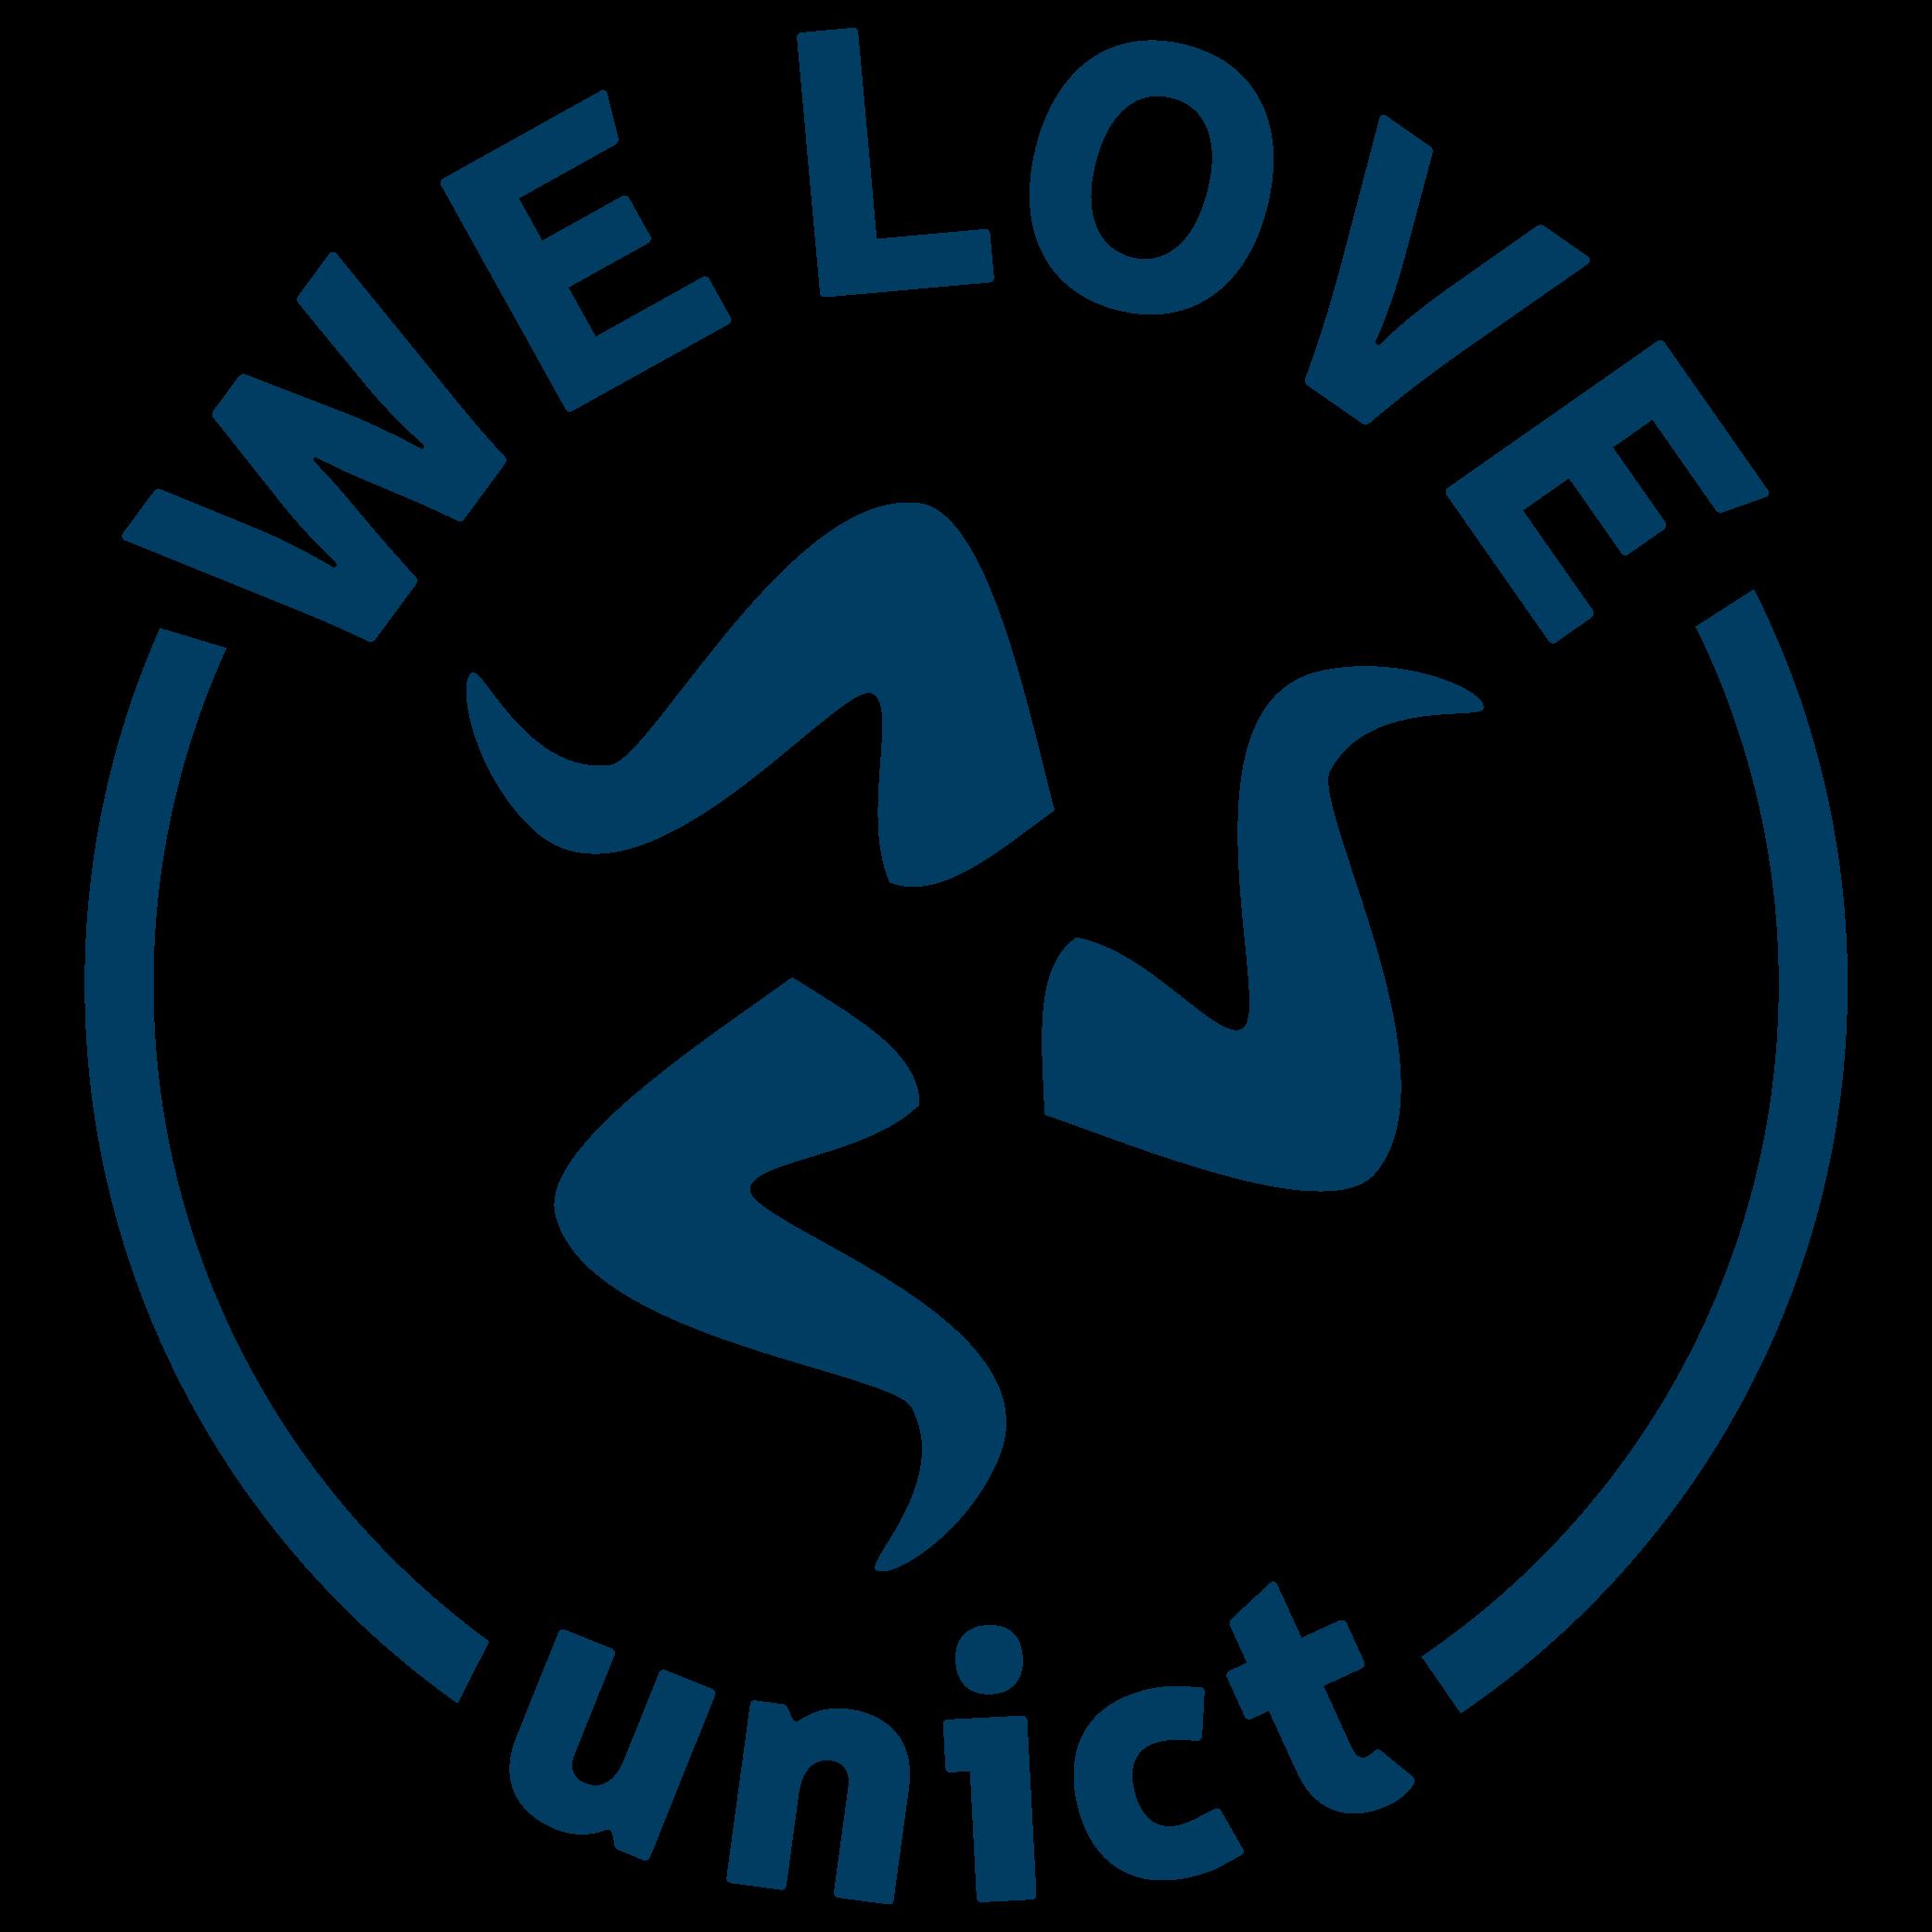 We Love Unict